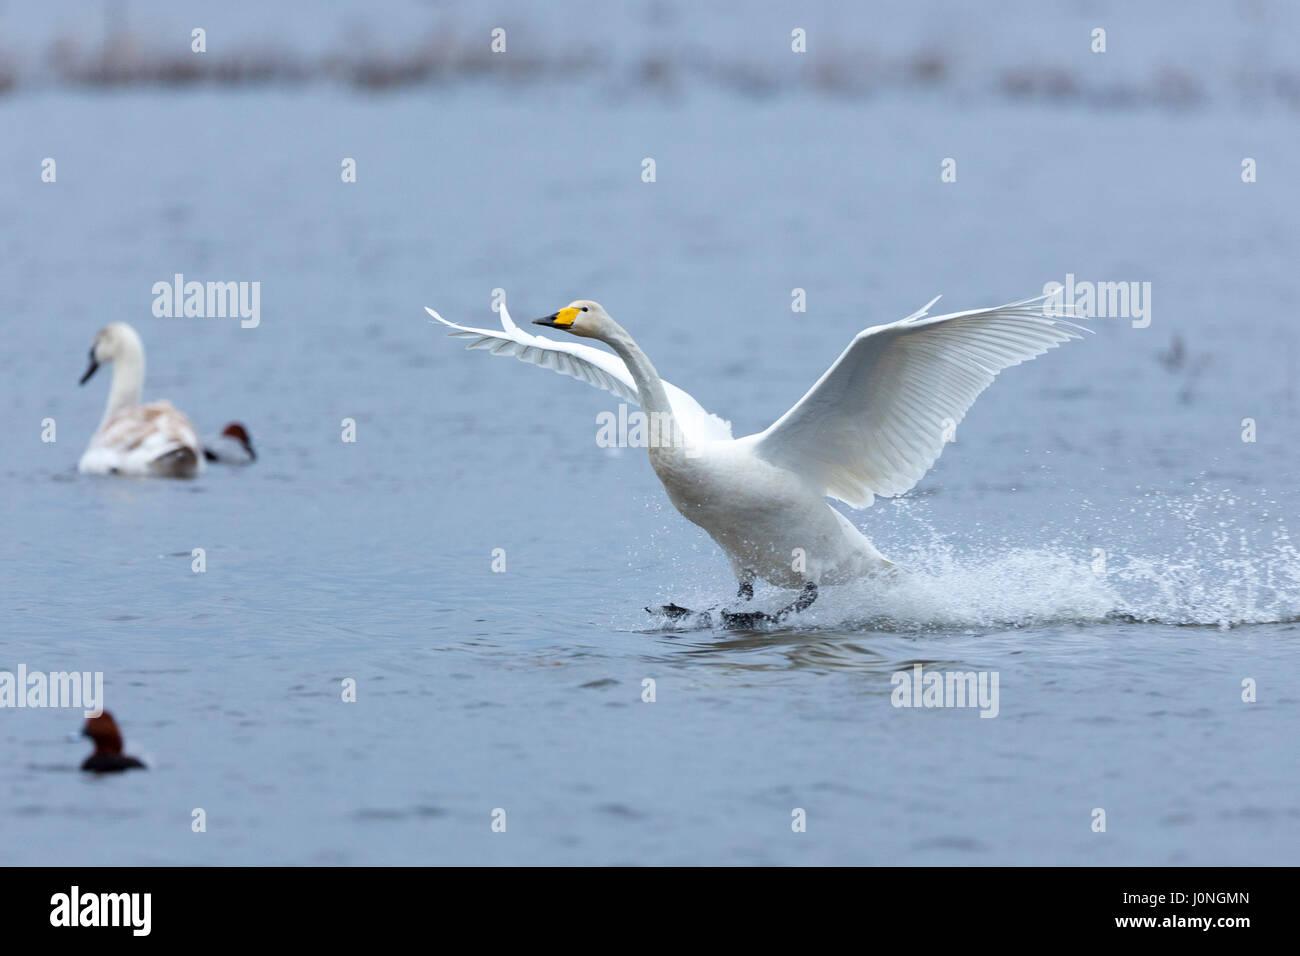 Whooper Swan, Cygnus cygnus, in flight with wings spread wide landing and splashing water at Welney Wetland Centre, - Stock Image